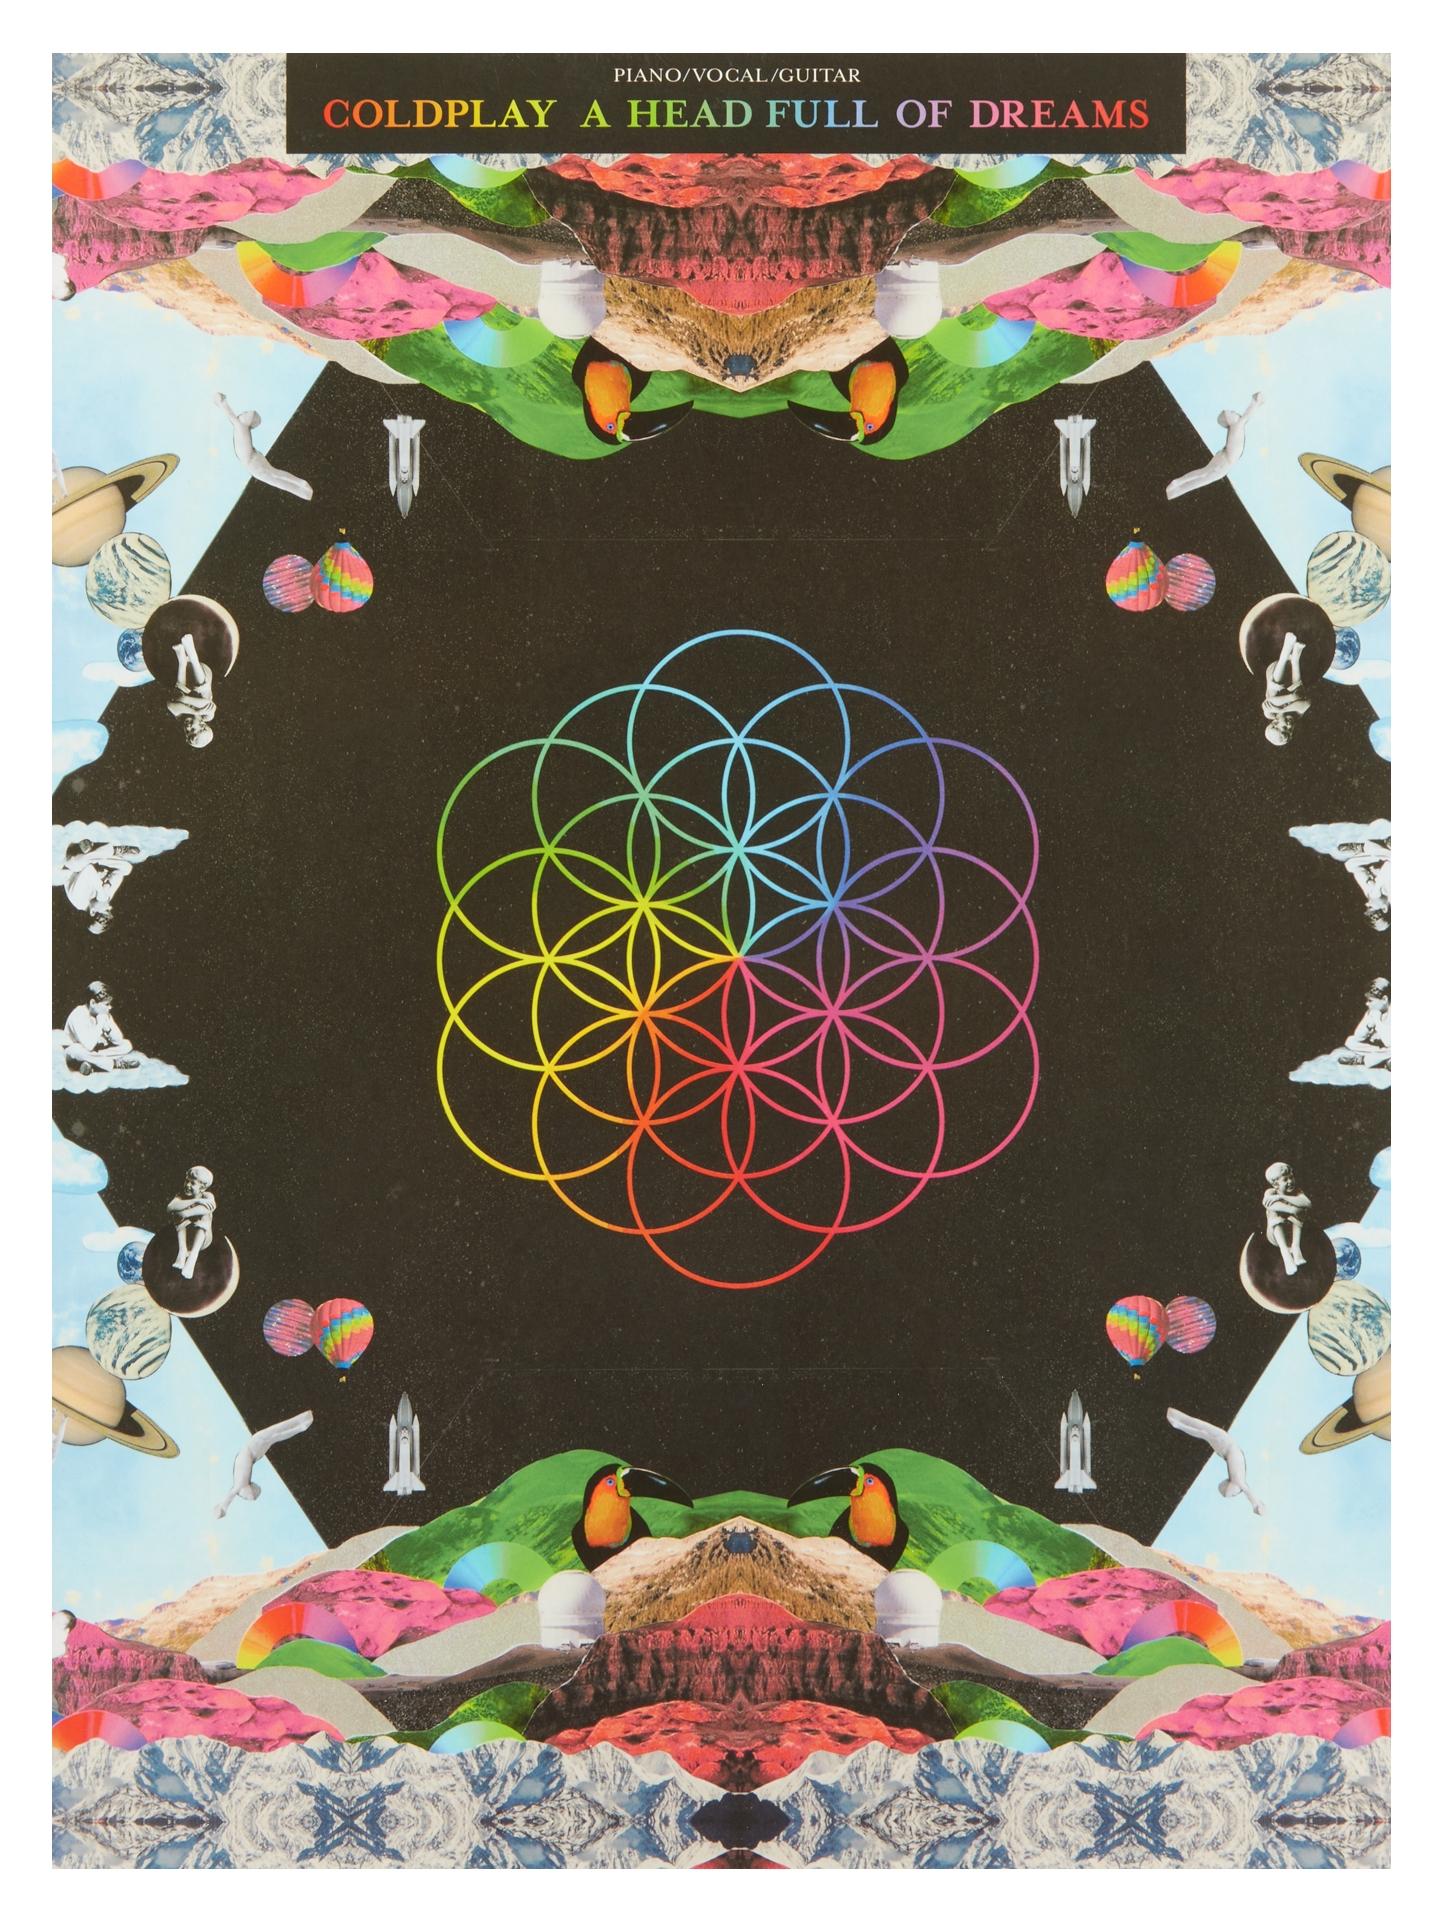 MS Coldplay: A Head Full Of Dreams